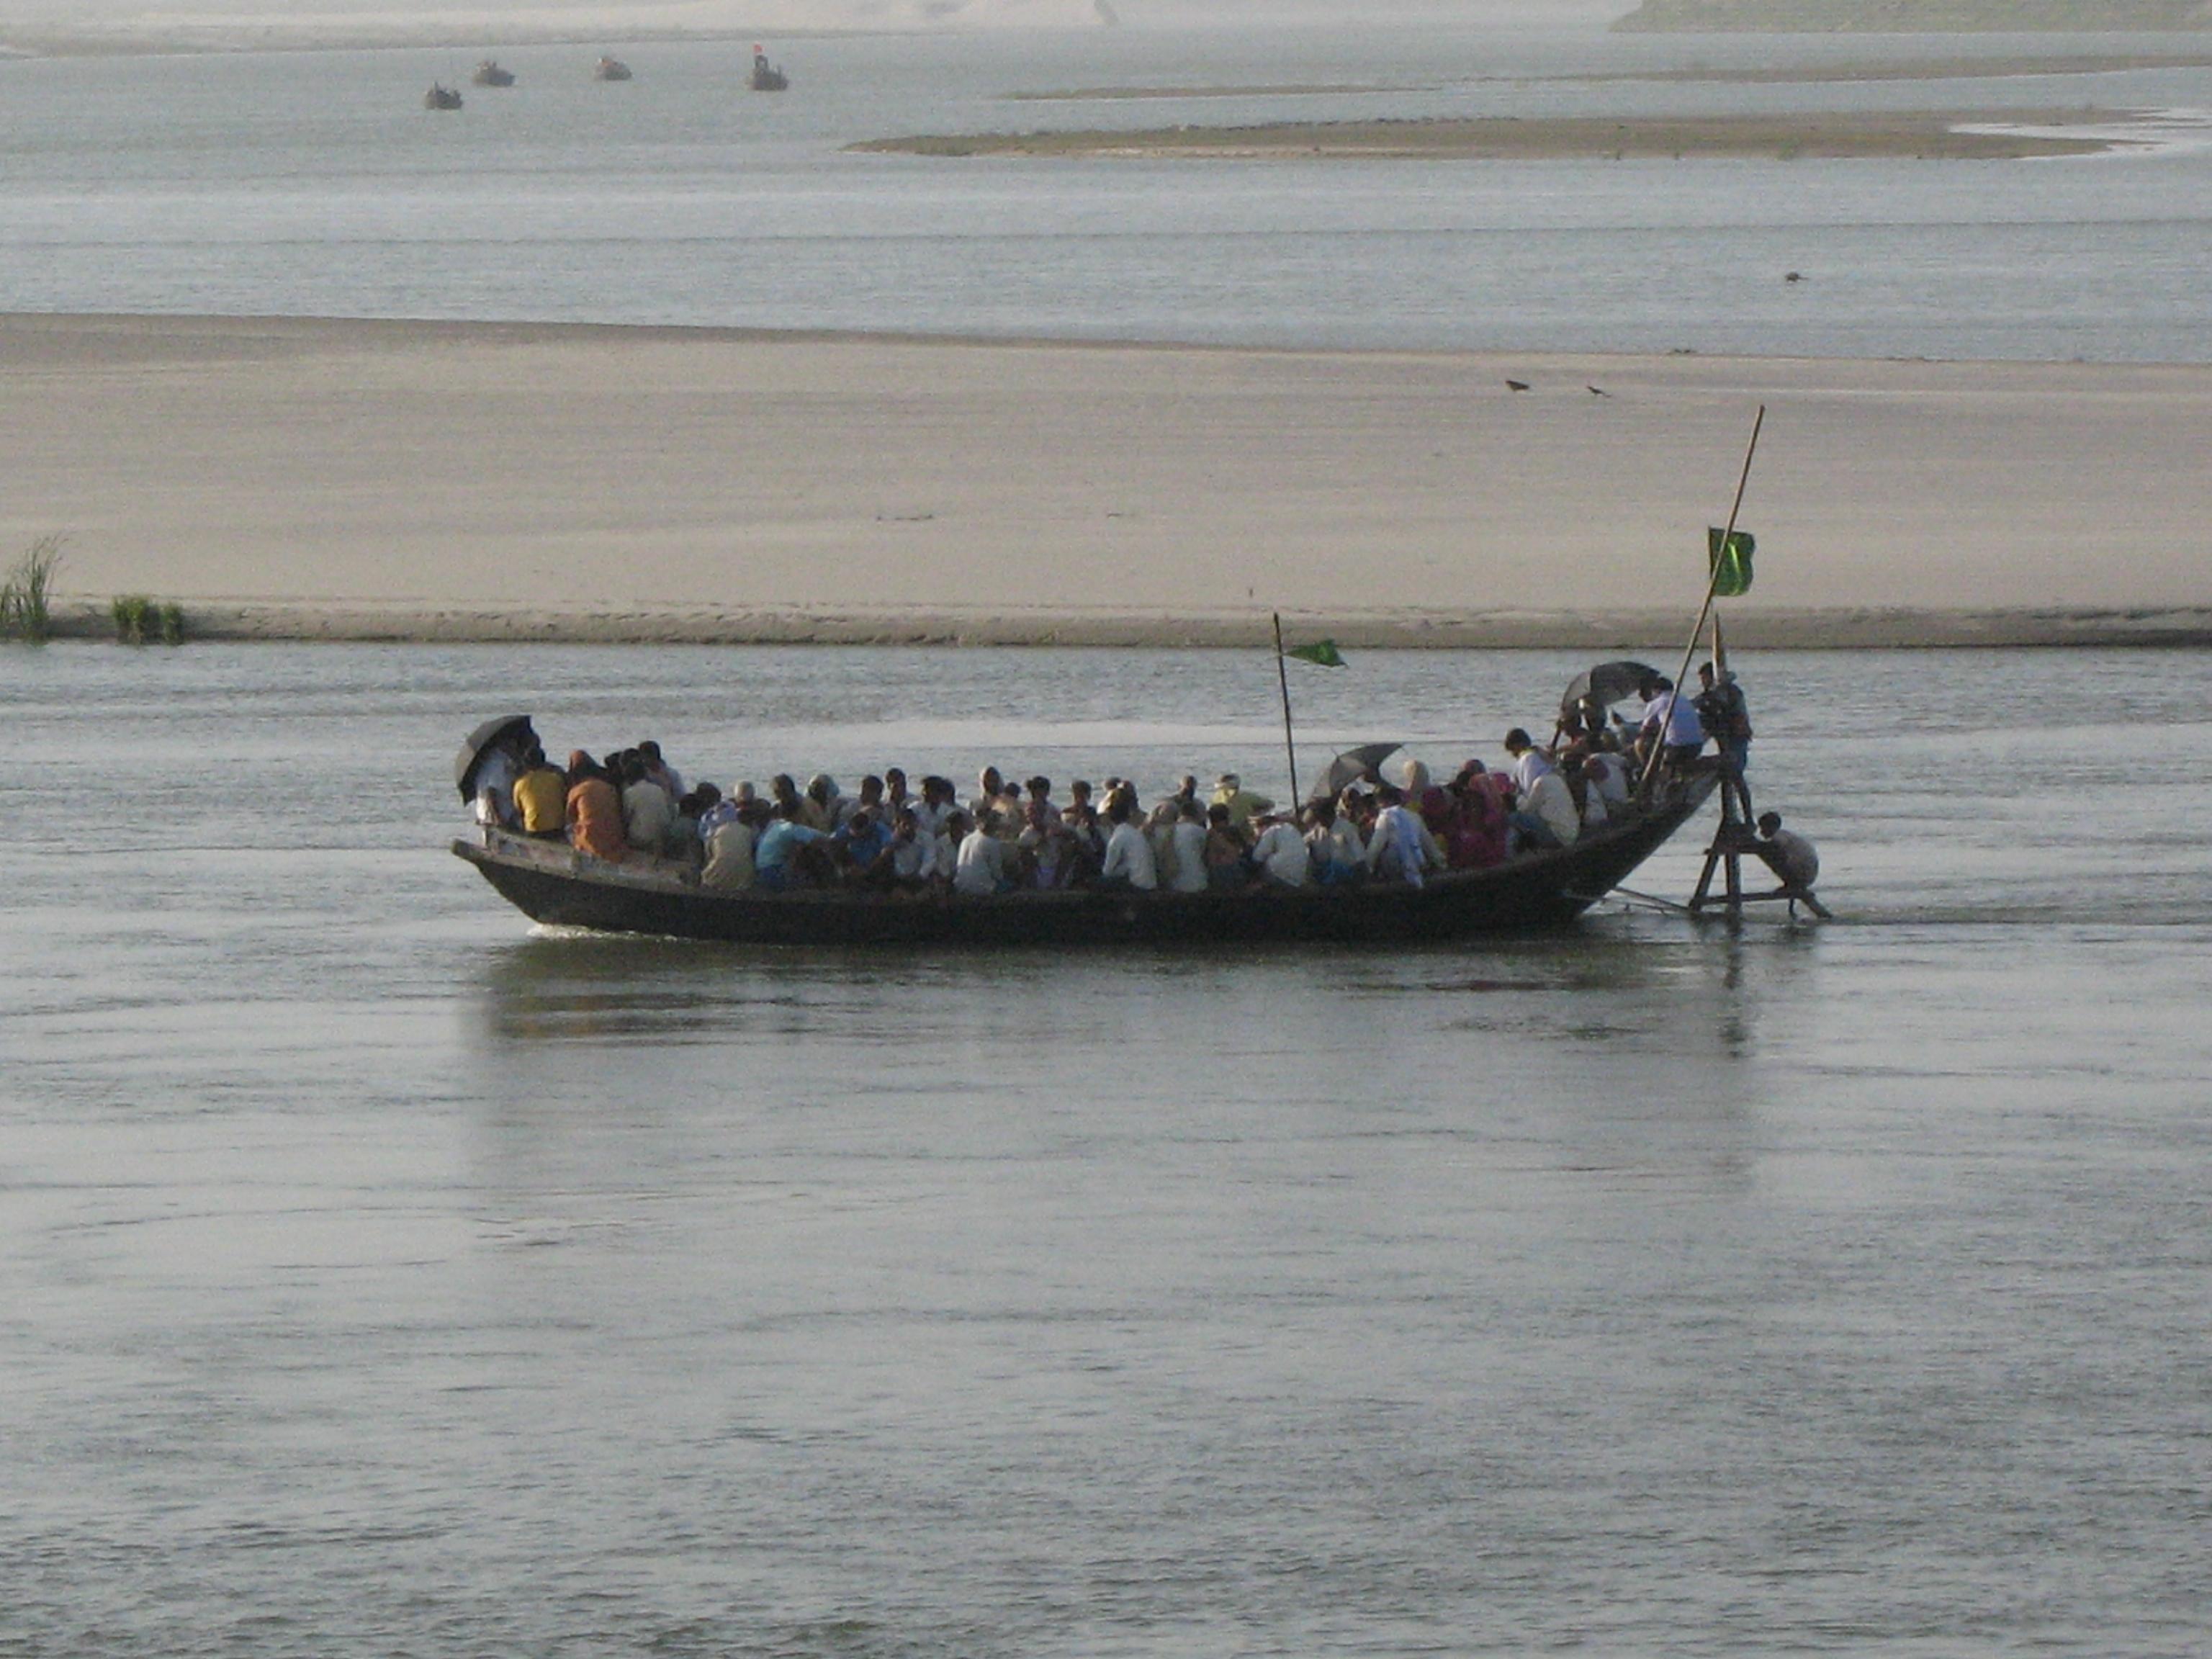 A boat in India.JPG